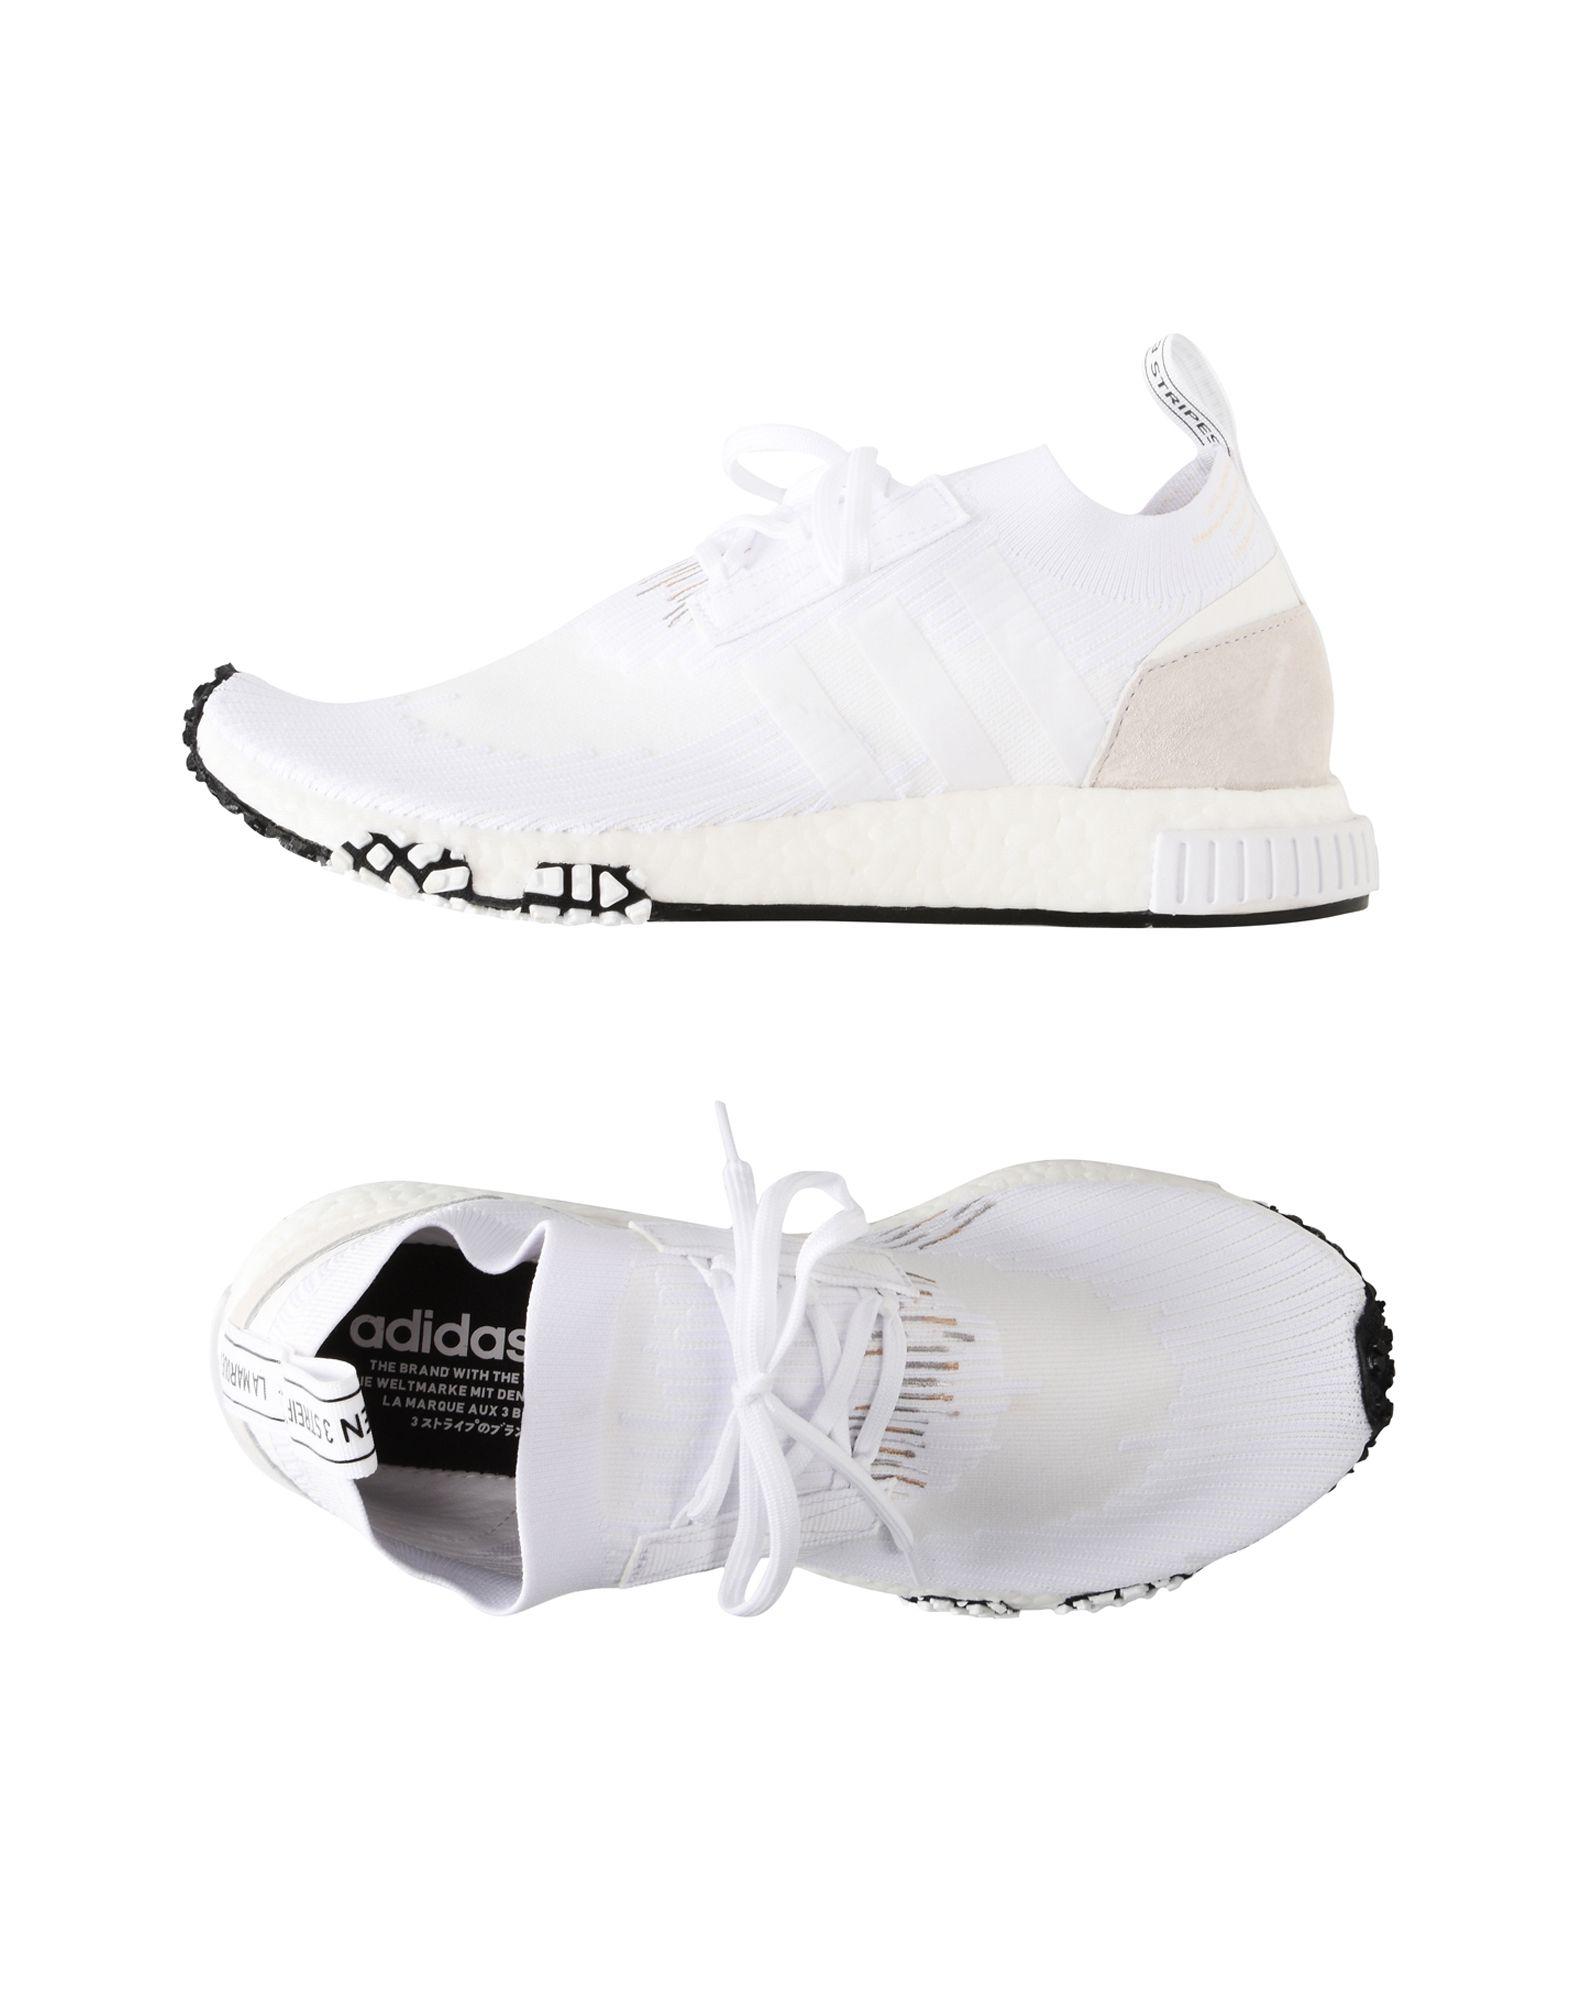 Adidas Originals Nmd_Racer Pk  11533645EF Gute Qualität beliebte Schuhe